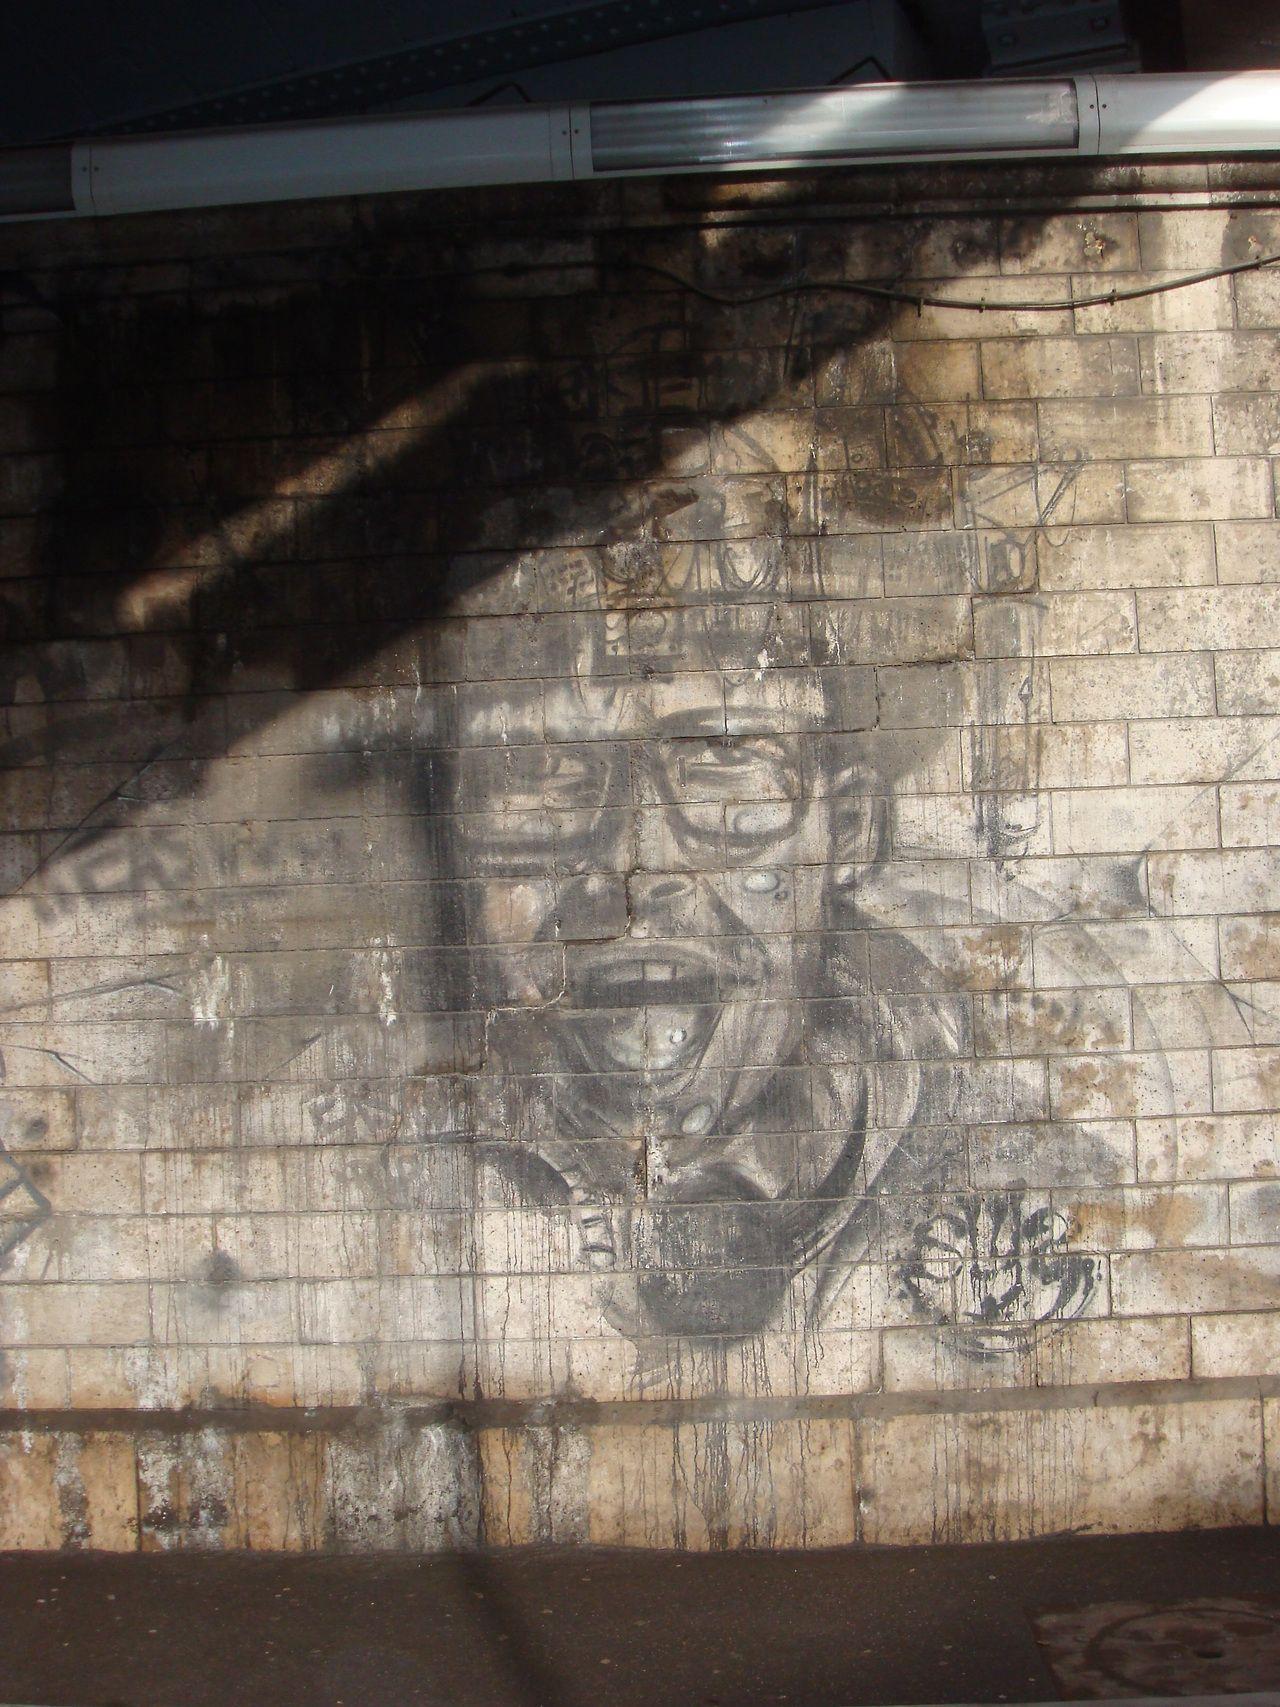 #StreetArt #UrbanArt #Graffiti - Vitry Sur Seine - Sly 2 (Photos by My Urban Island)